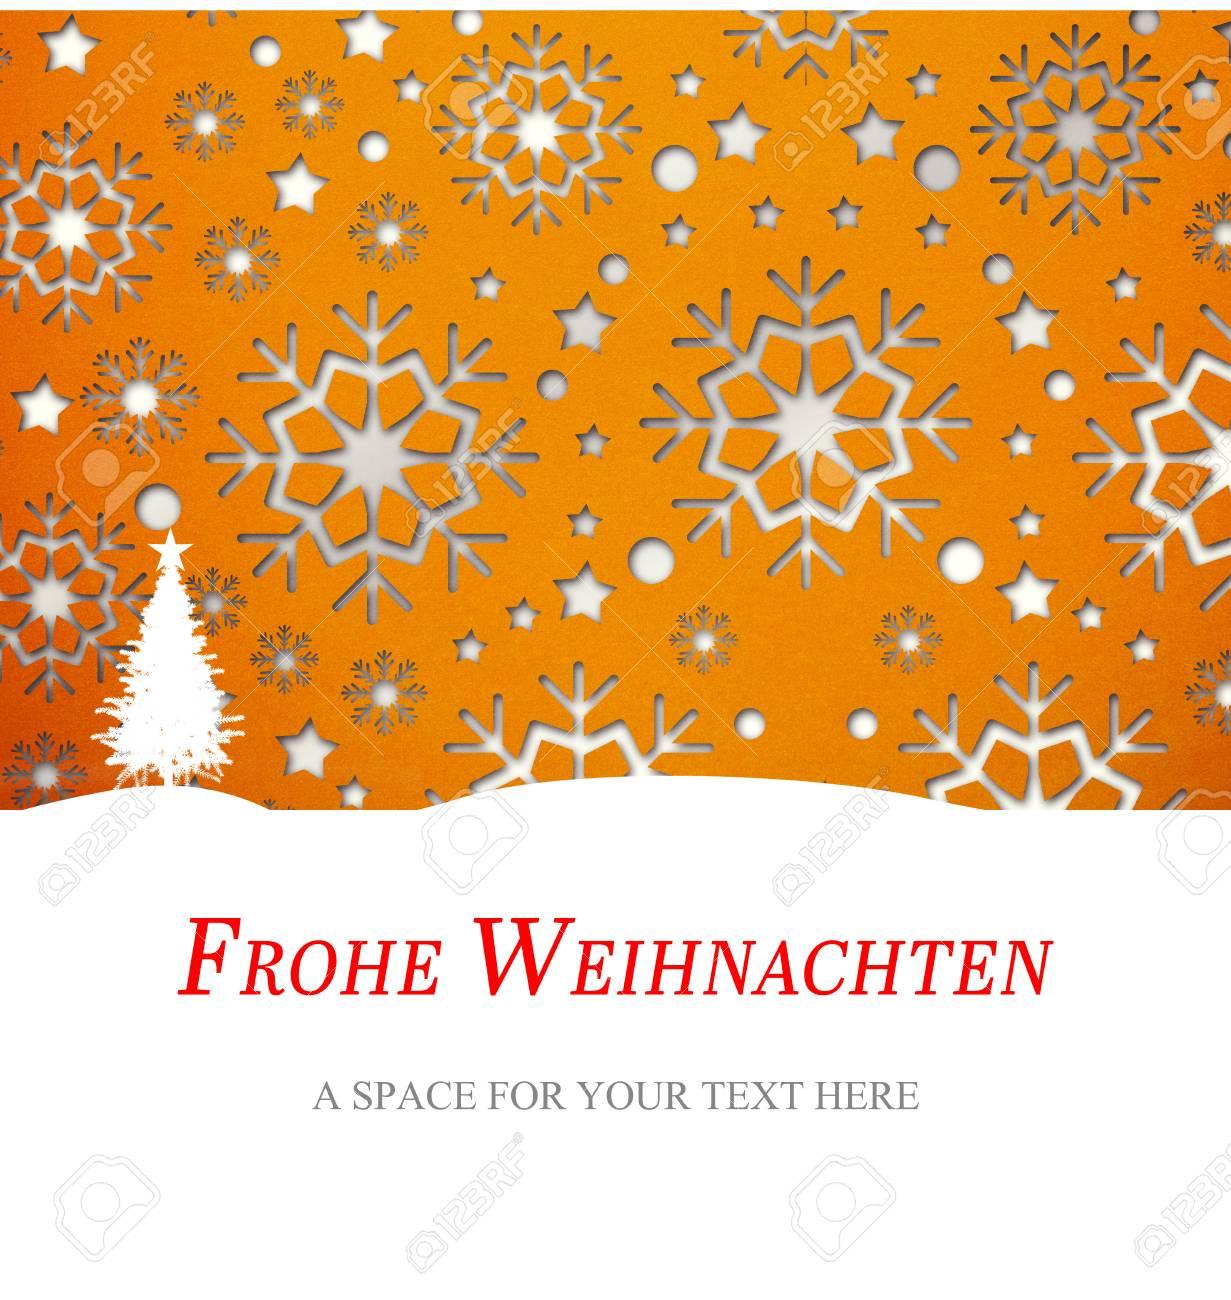 Christmas greeting in german against snowflake wallpaper pattern christmas greeting in german against snowflake wallpaper pattern stock photo 42971056 m4hsunfo